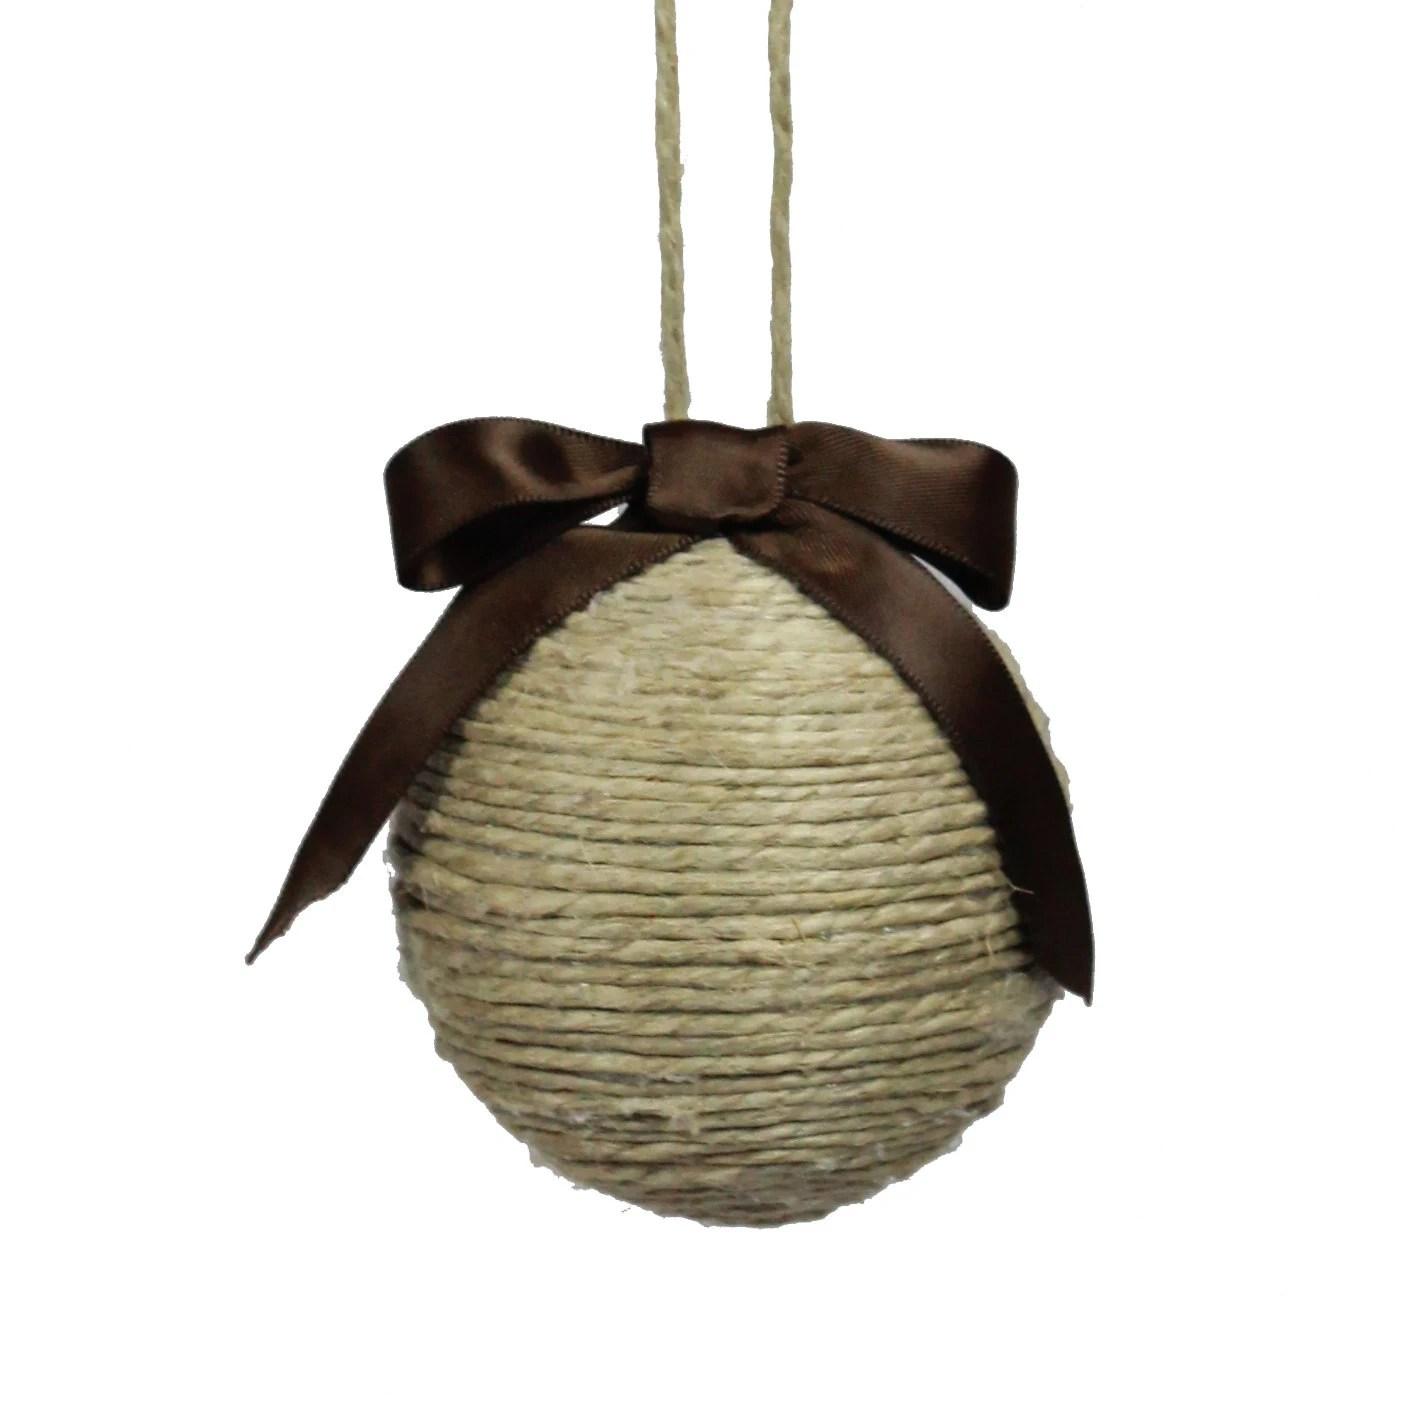 Jute String Ornament Christmas Rustic Wedding Unique Christmas Decor - FoundationCreations